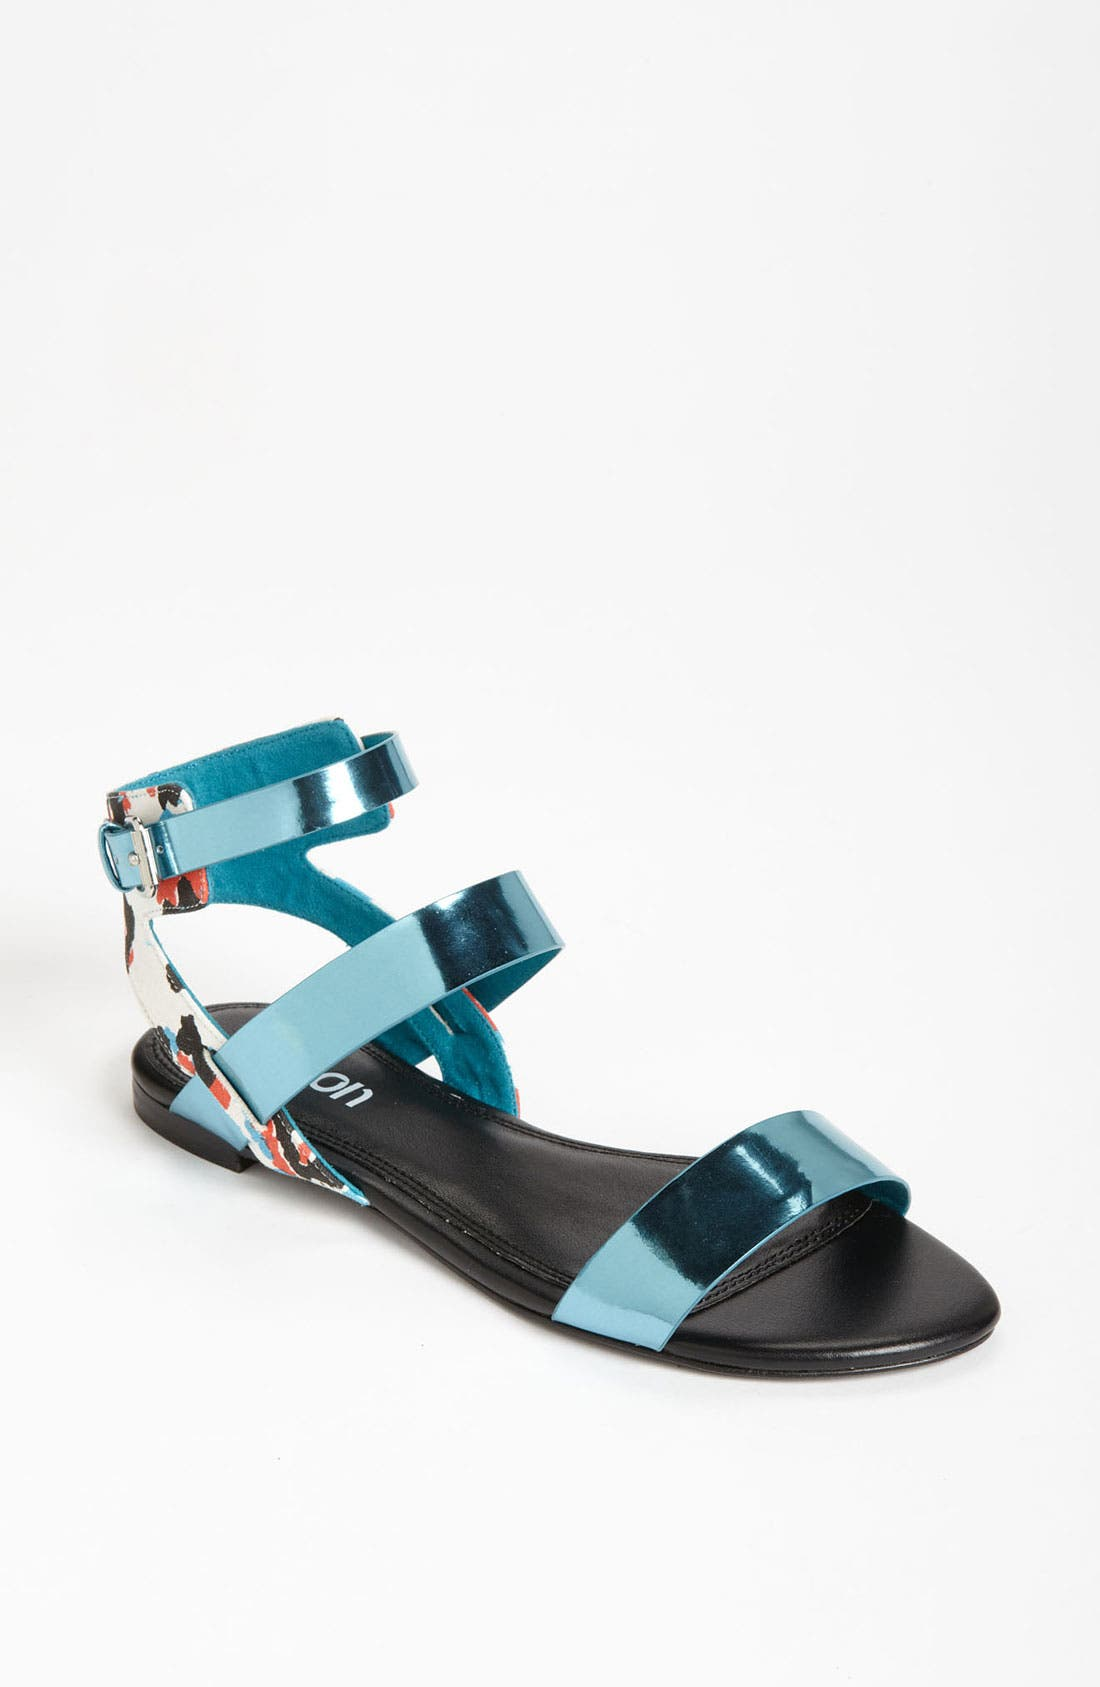 Alternate Image 1 Selected - Tildon 'Alexia' Sandal